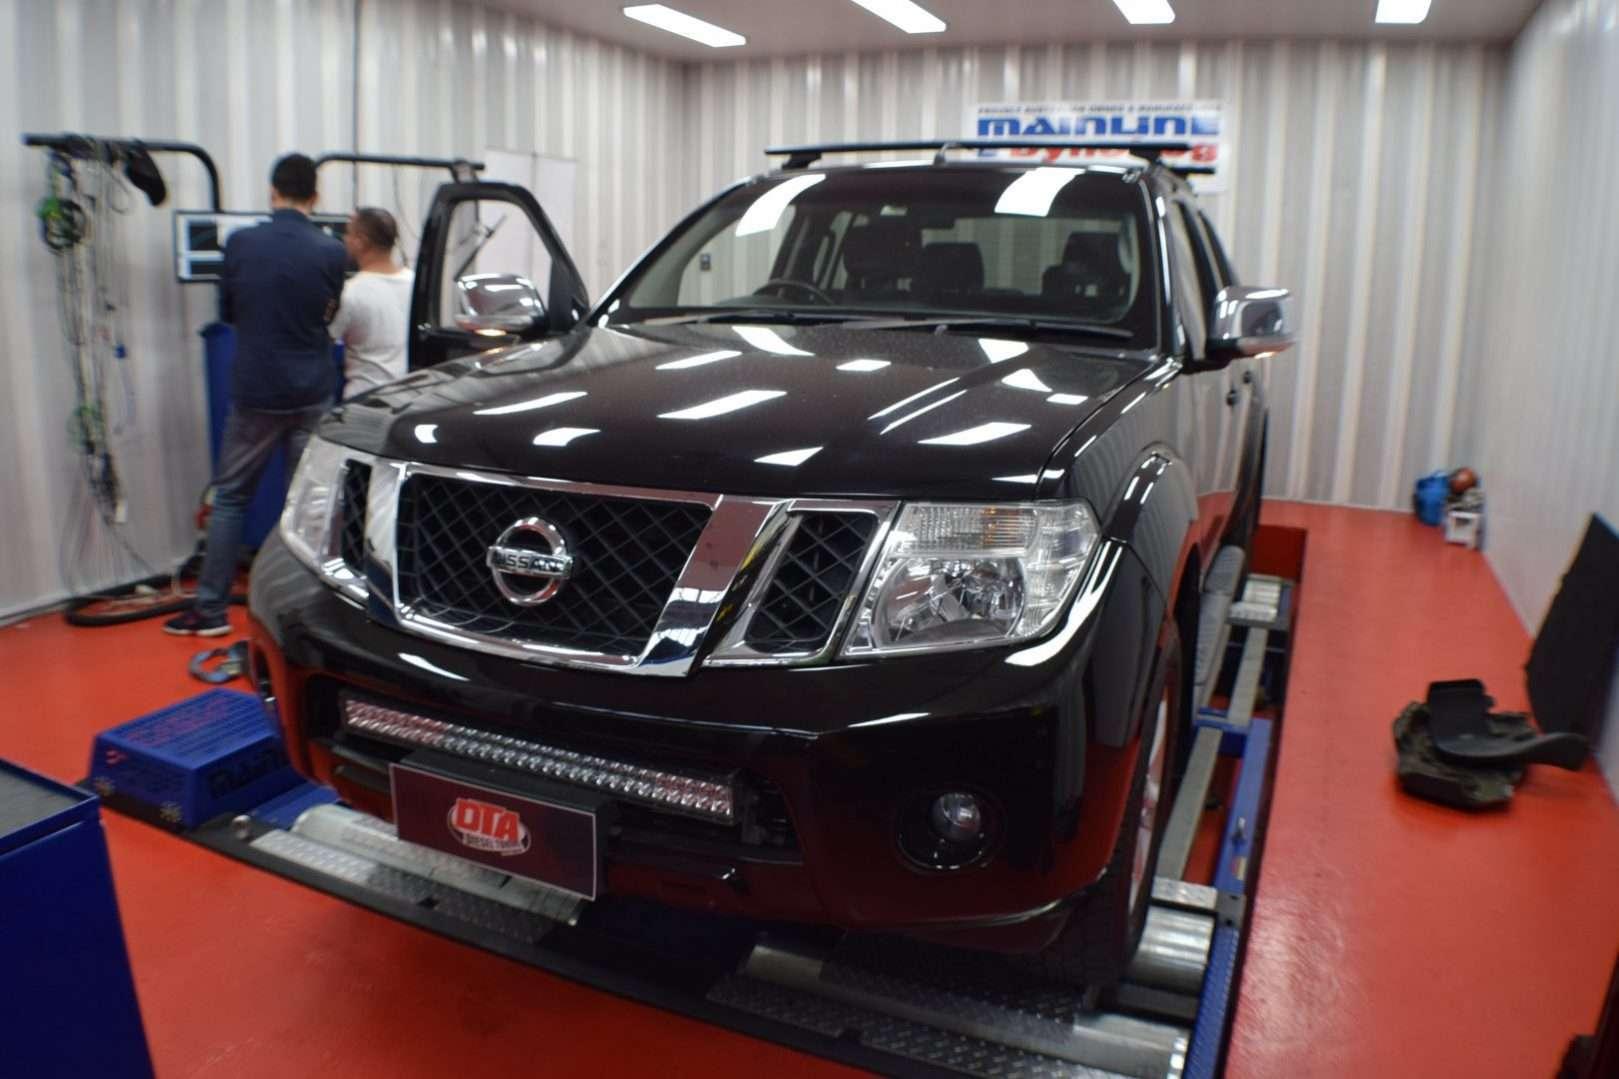 nissan navara 2 5l 140 kw ecu remap diesel tuning specialist rh dieseltuningaustralia com au Nissan Navara D40 Engine Nissan Navara D40 Engine